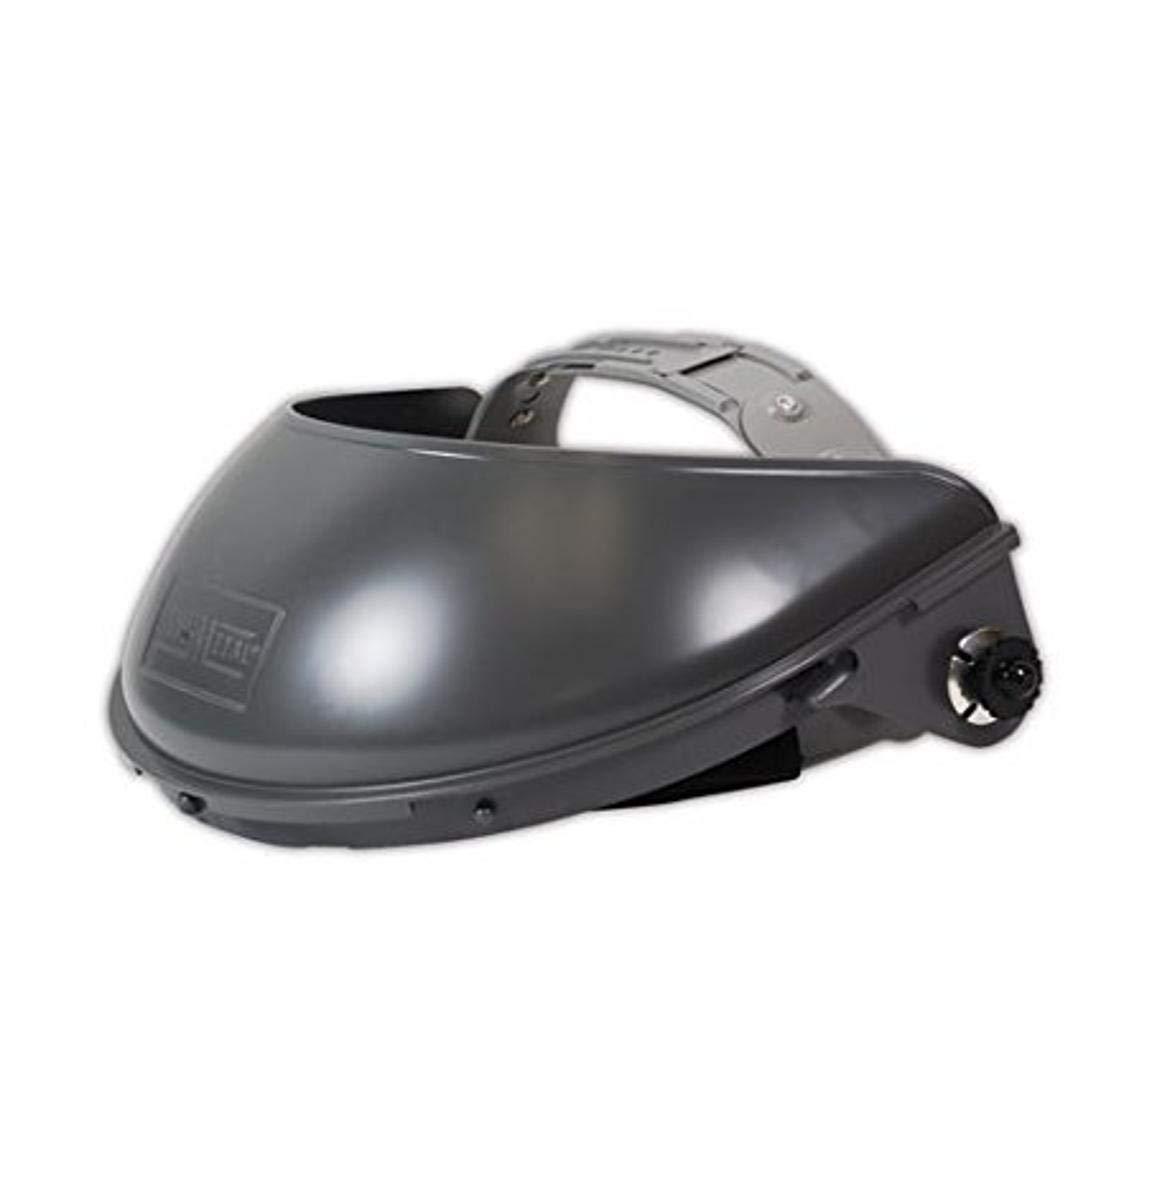 Fibre-Metal Hard Hat National uniform free shipping - FIBF400 4